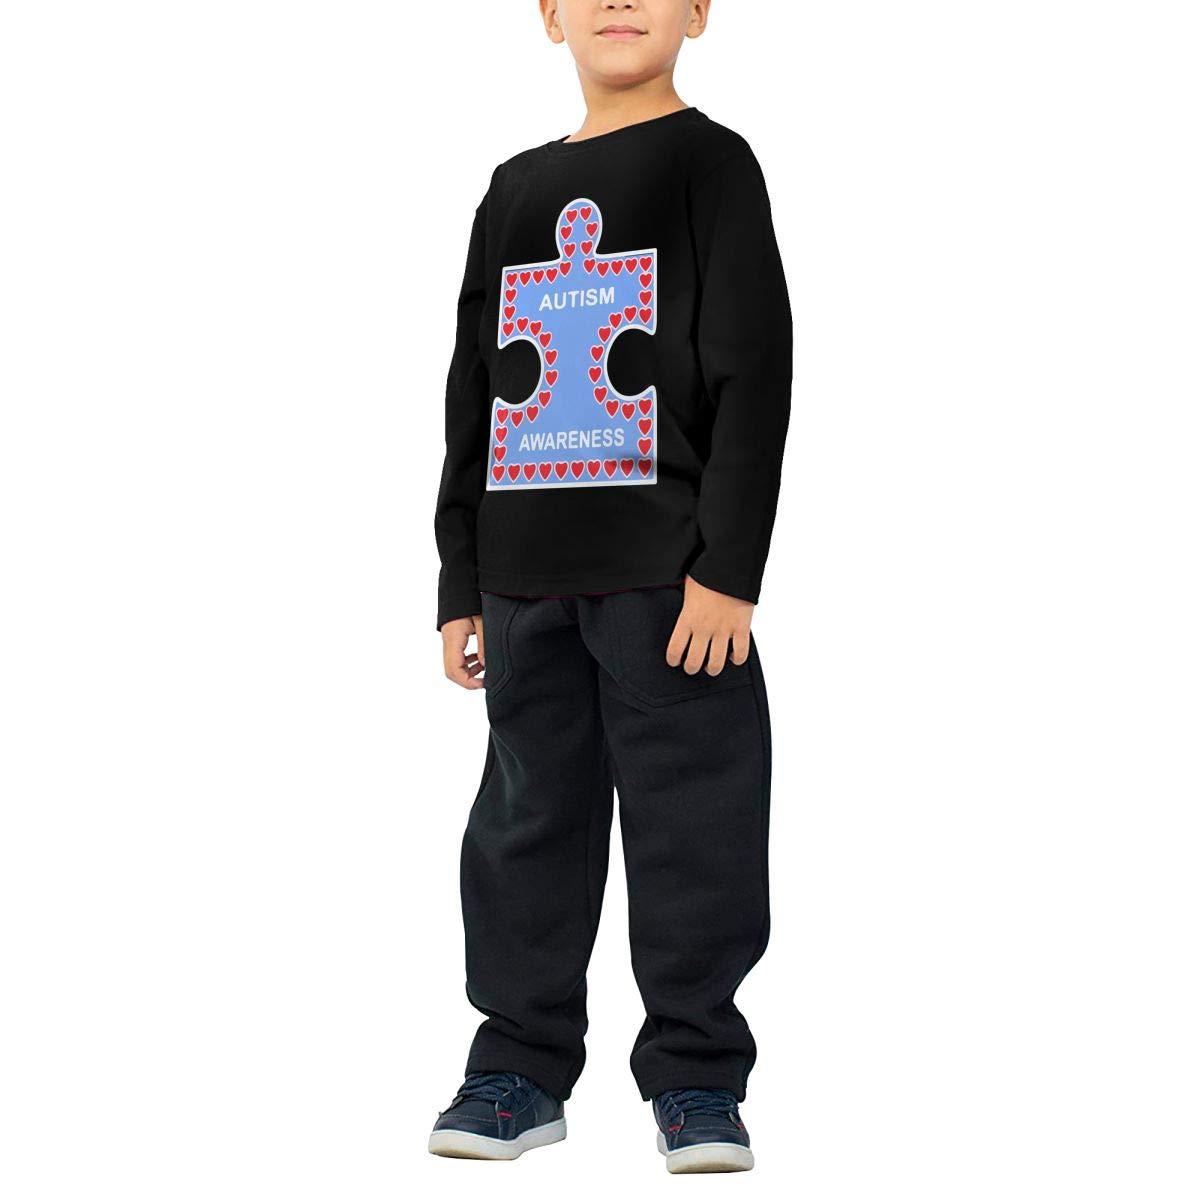 CERTONGCXTS Little Boys Autism Awareness ComfortSoft Long Sleeve Tee